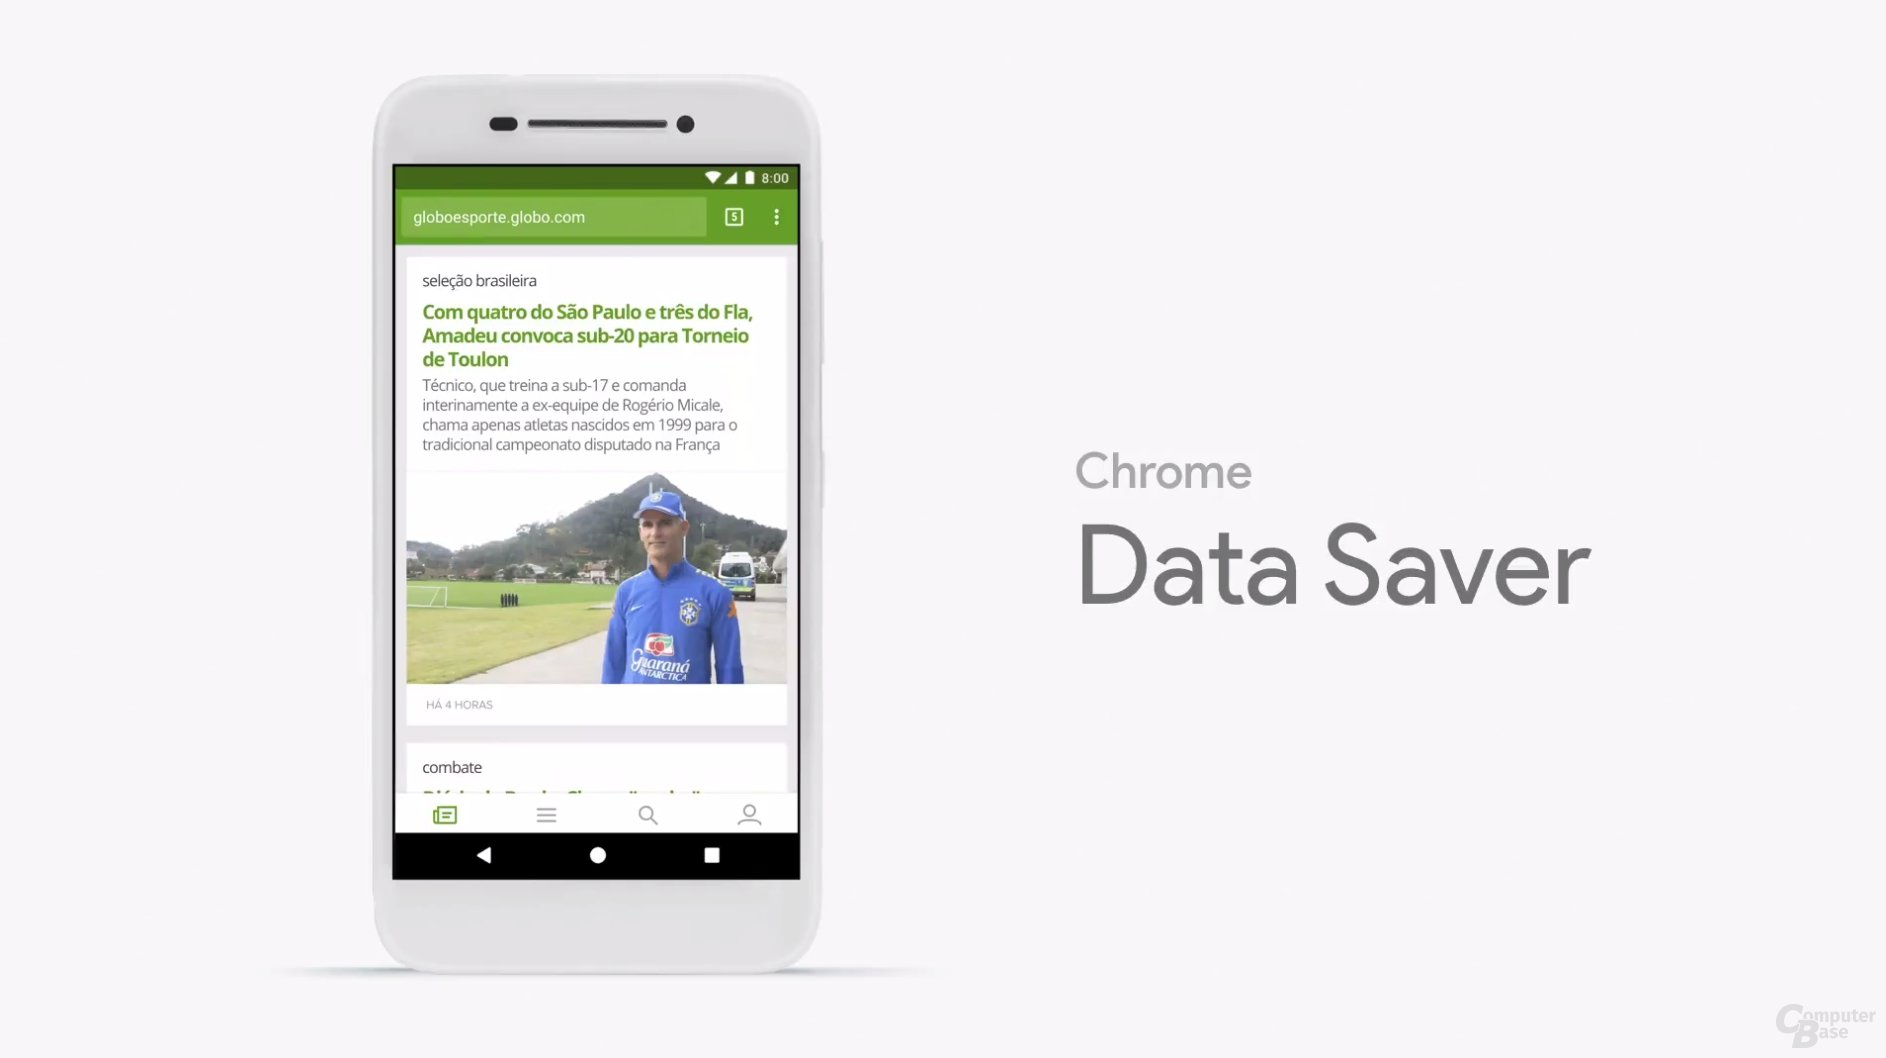 Data Saver in Chrome ist standardmäßig aktiviert